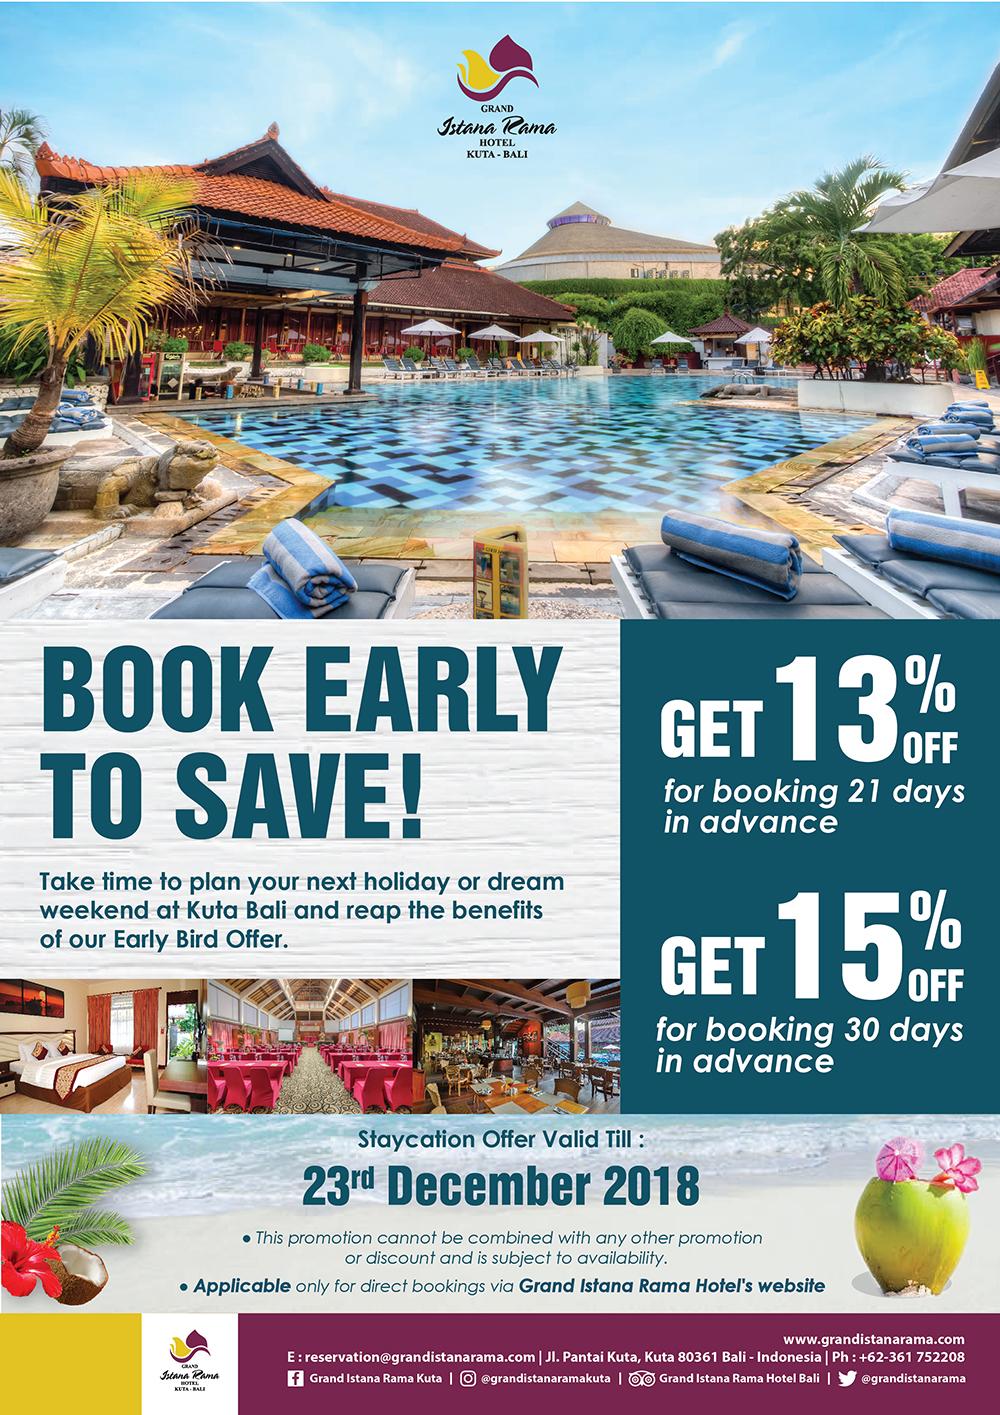 Promotions Grand Istana Rama Voucher Hotel Ayodya Resort Bali Deluxe Bed An Breakfast Book